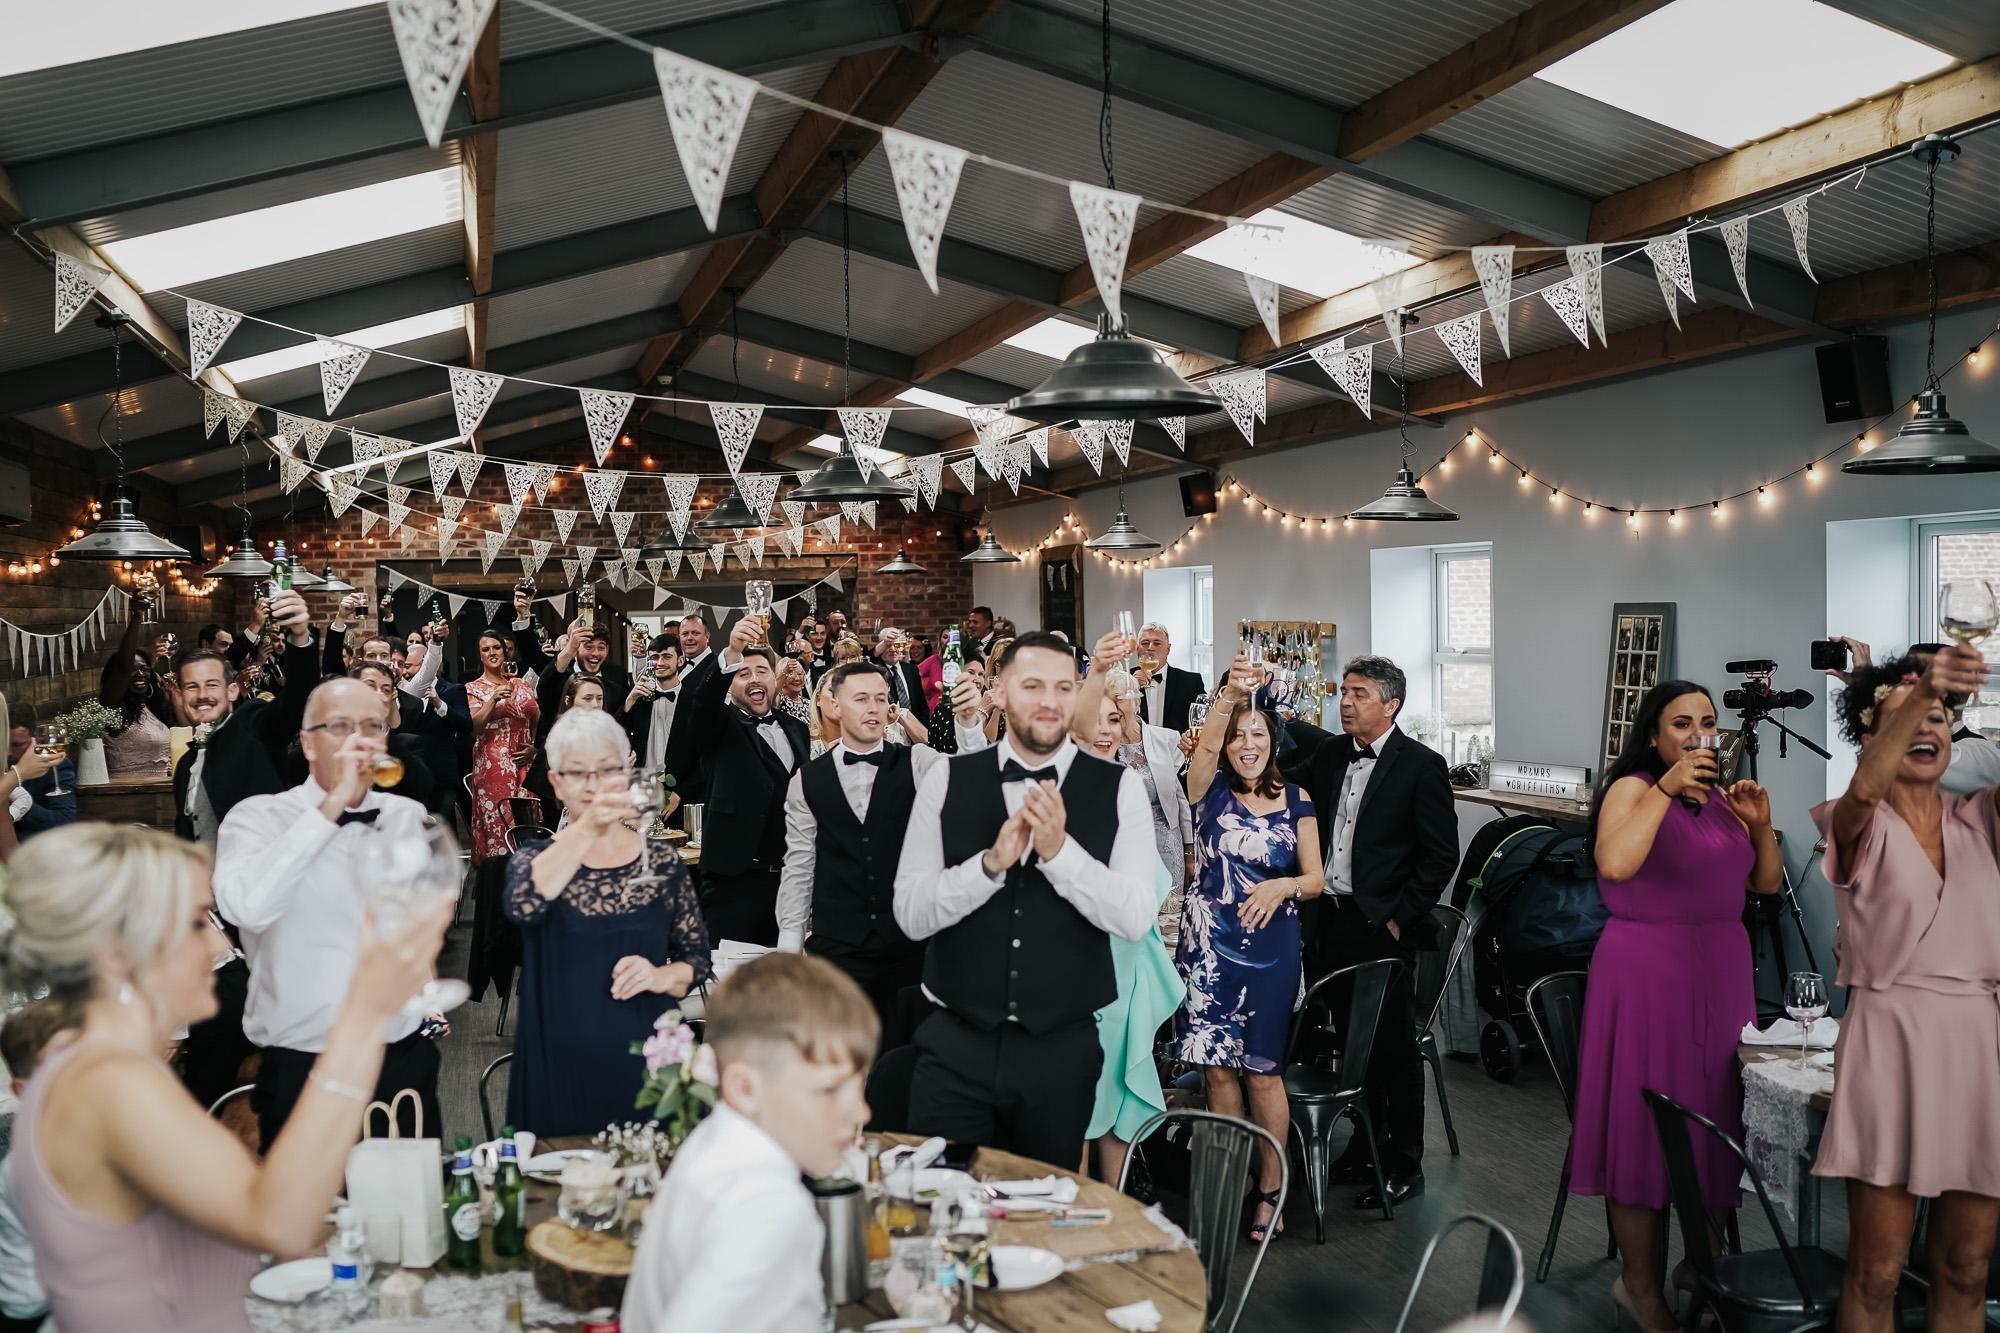 The Hayloft Wedding Photography Cheshire wedding photographer (46 of 52).jpg